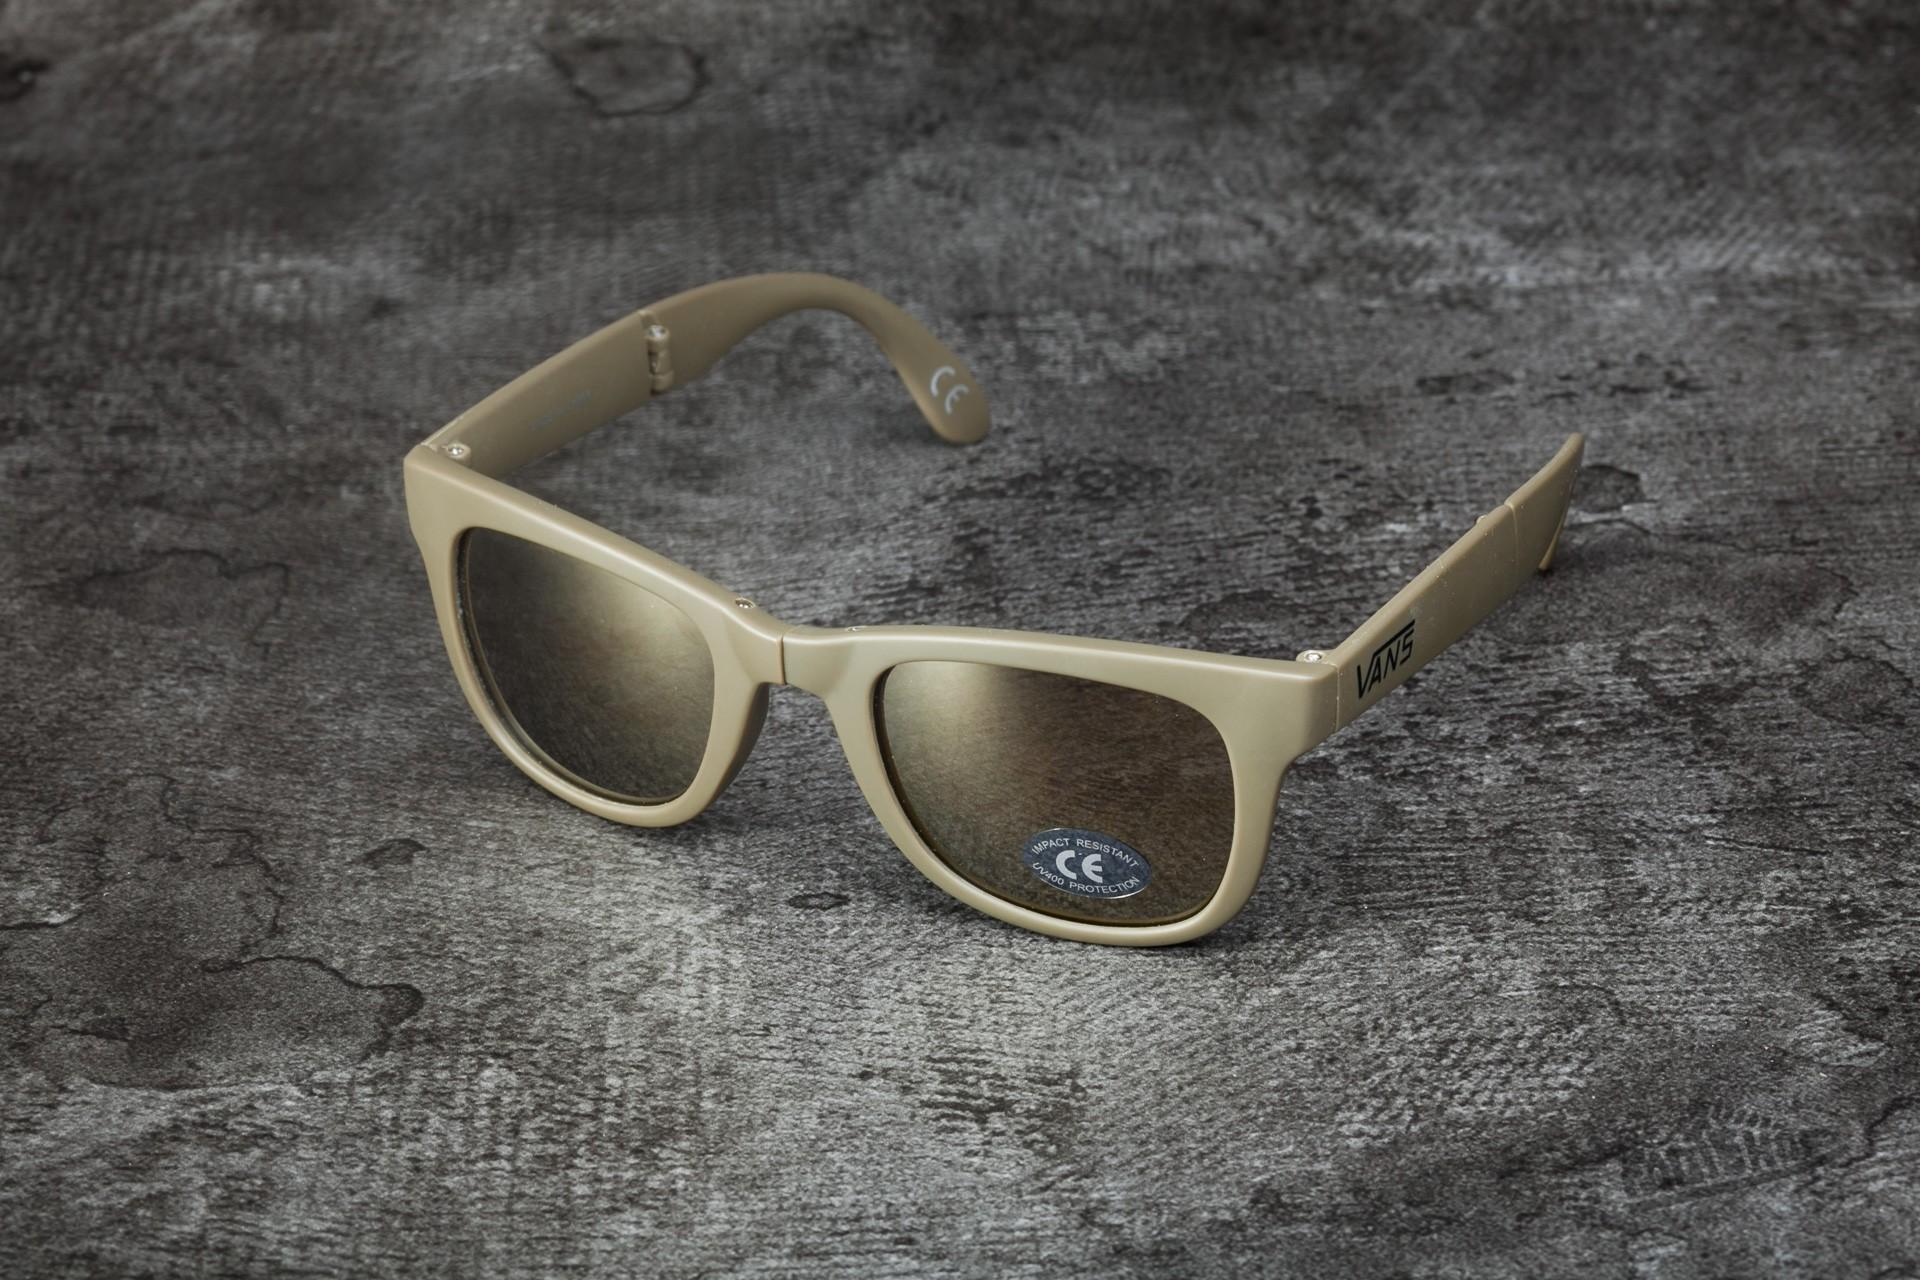 Vans Foldable Spicol Guacamole Sunglasses